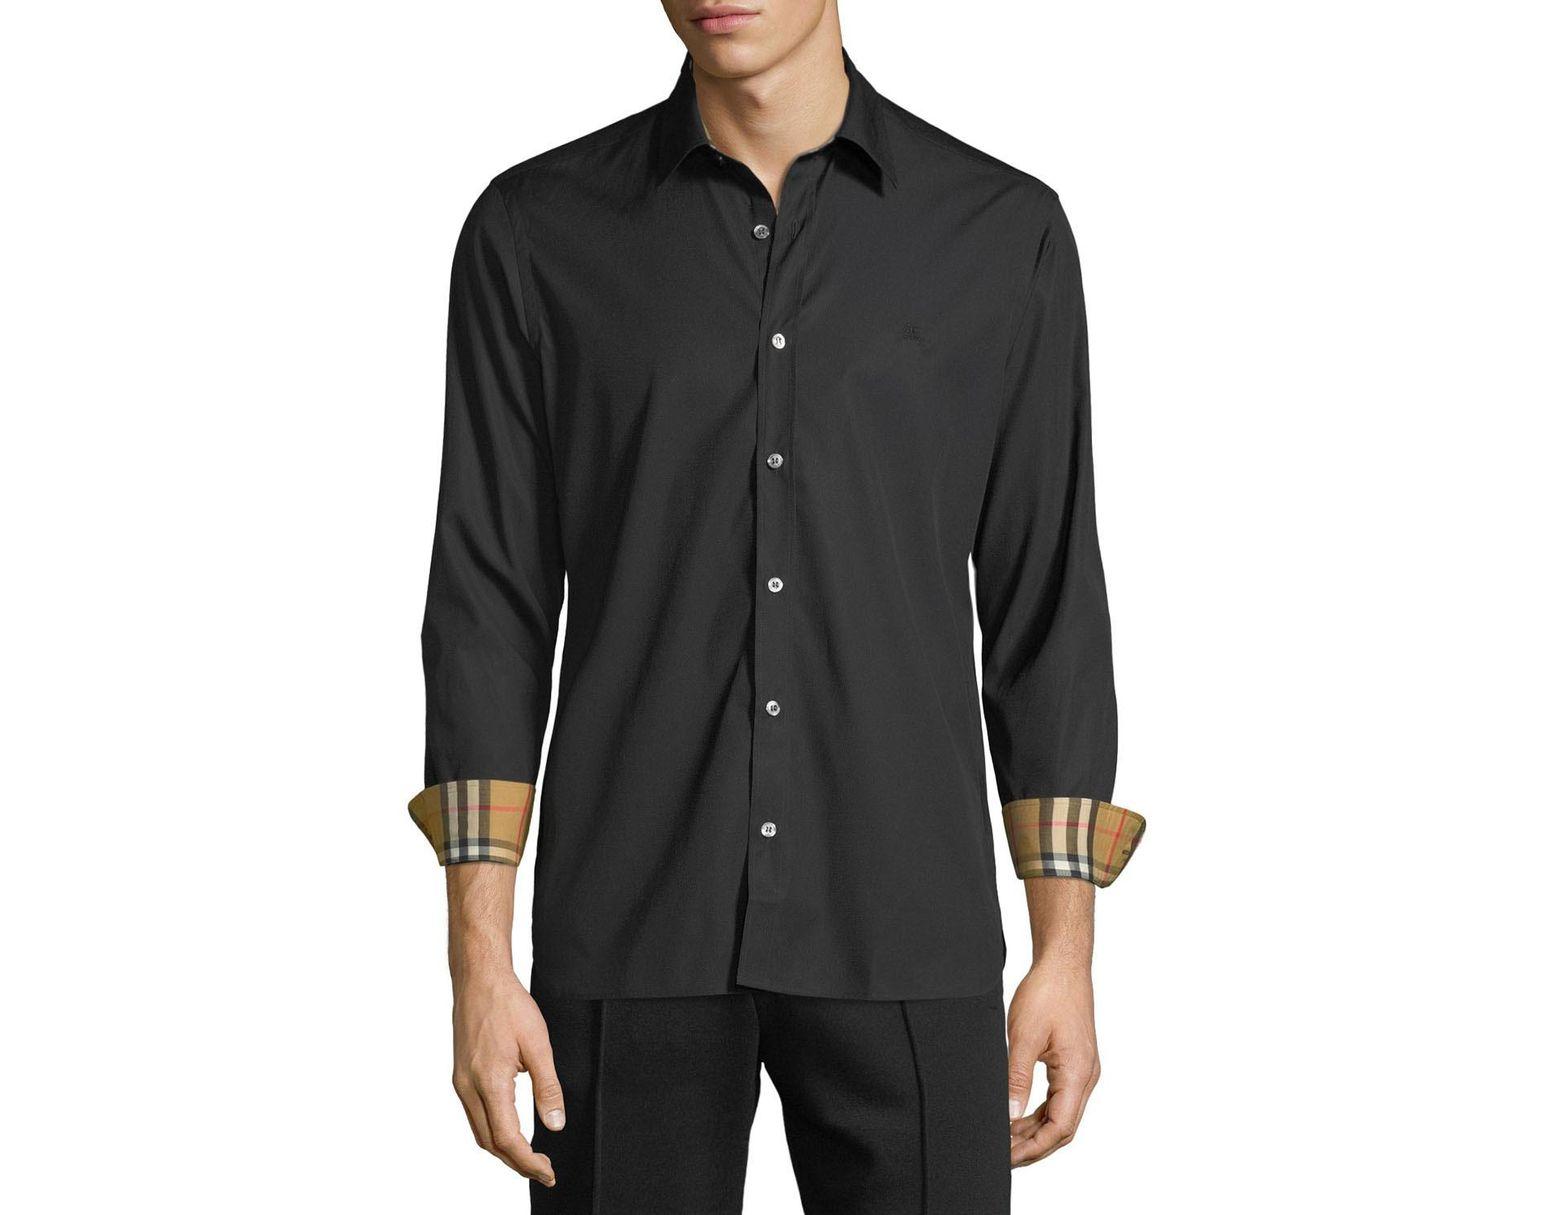 e359049d Burberry Men's William Signature Check-facing Sport Shirt in Black for Men  - Save 32% - Lyst